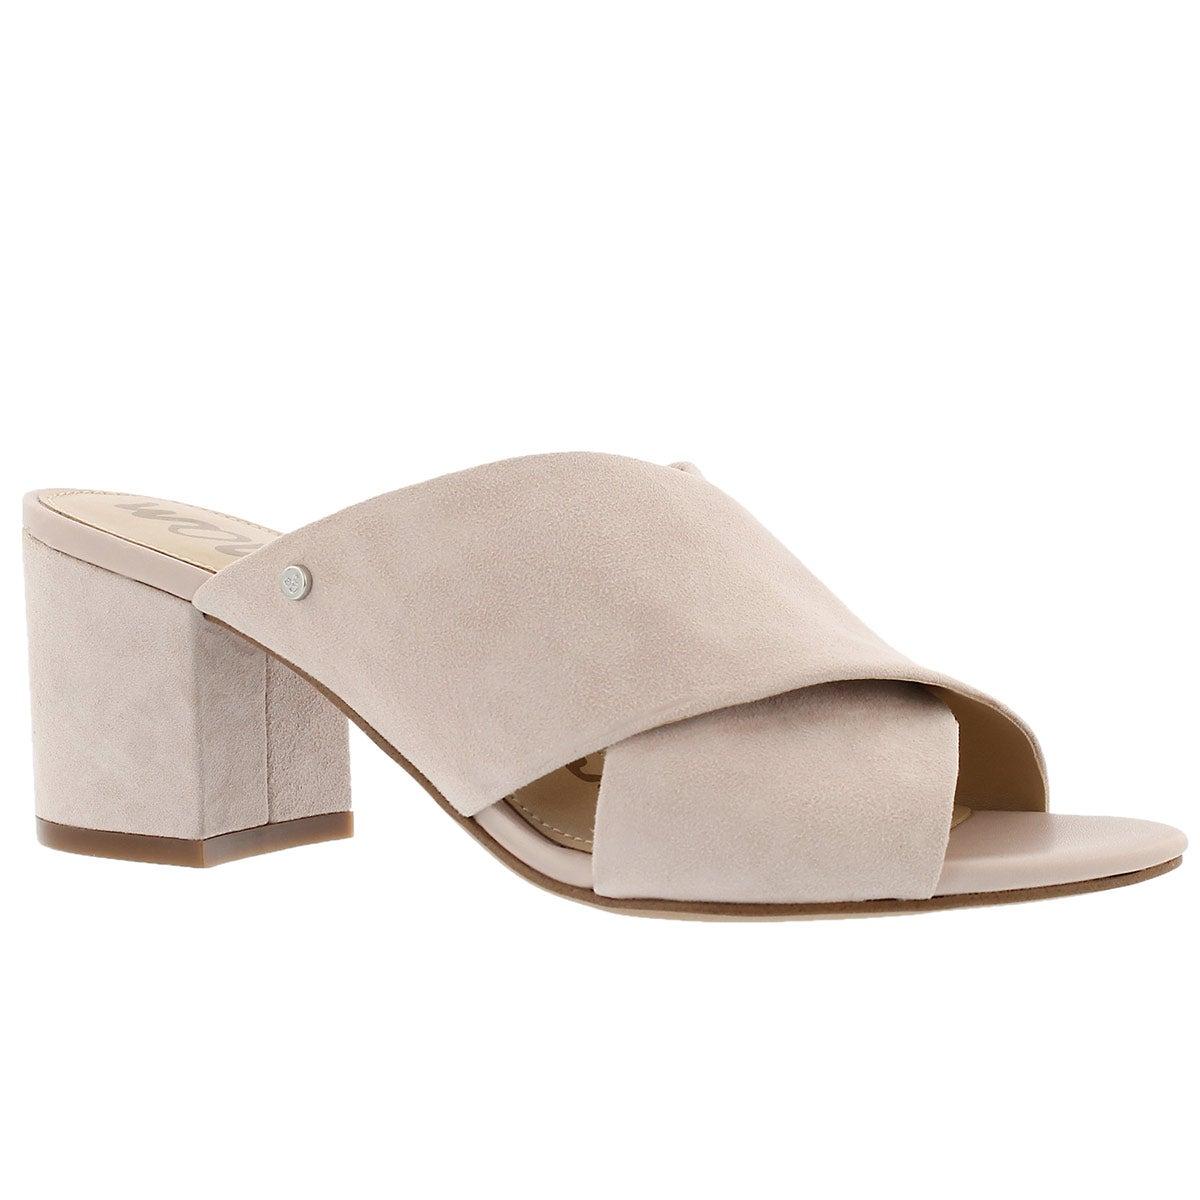 Women's STANLEY primrose slide dress sandals